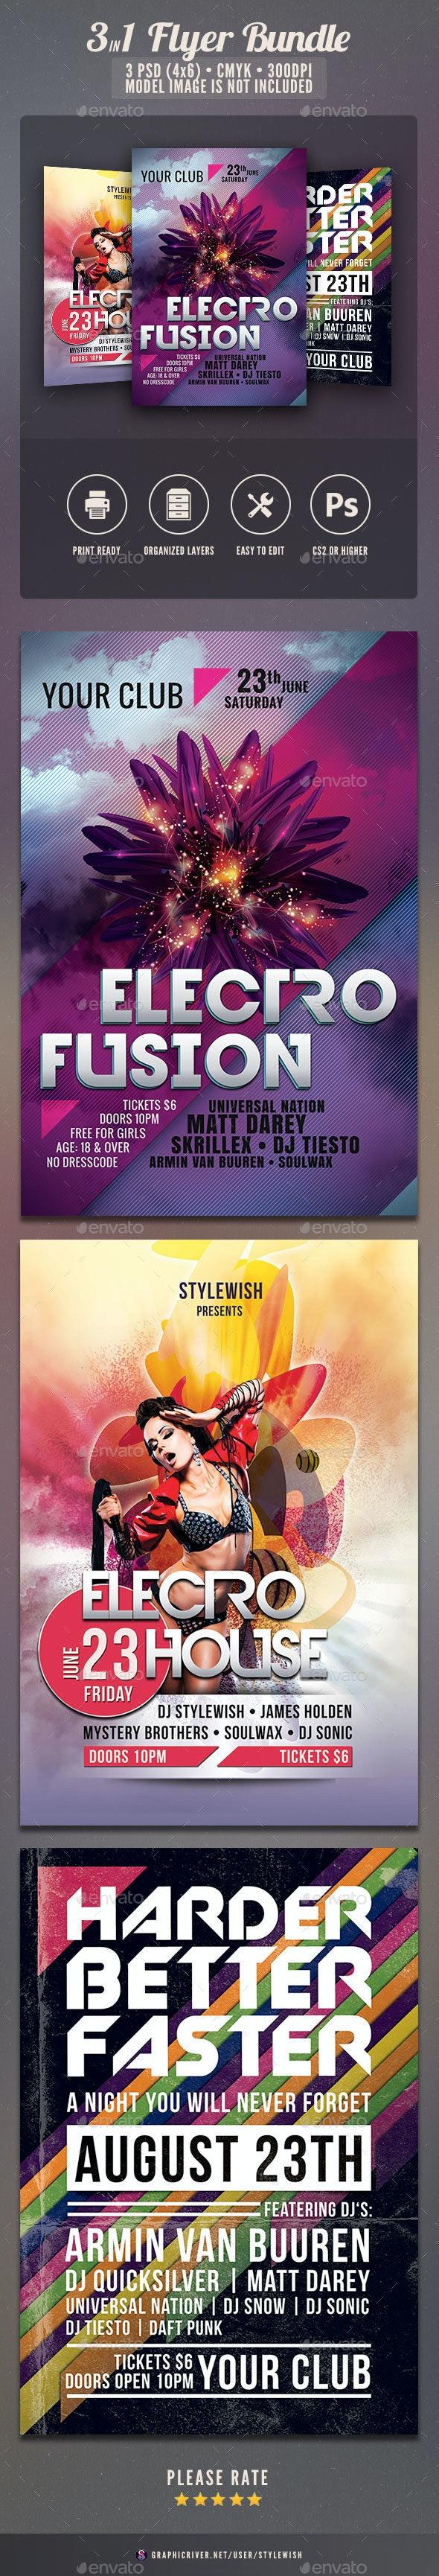 Electro Party Flyer Bundle - Clubs & Parties Events